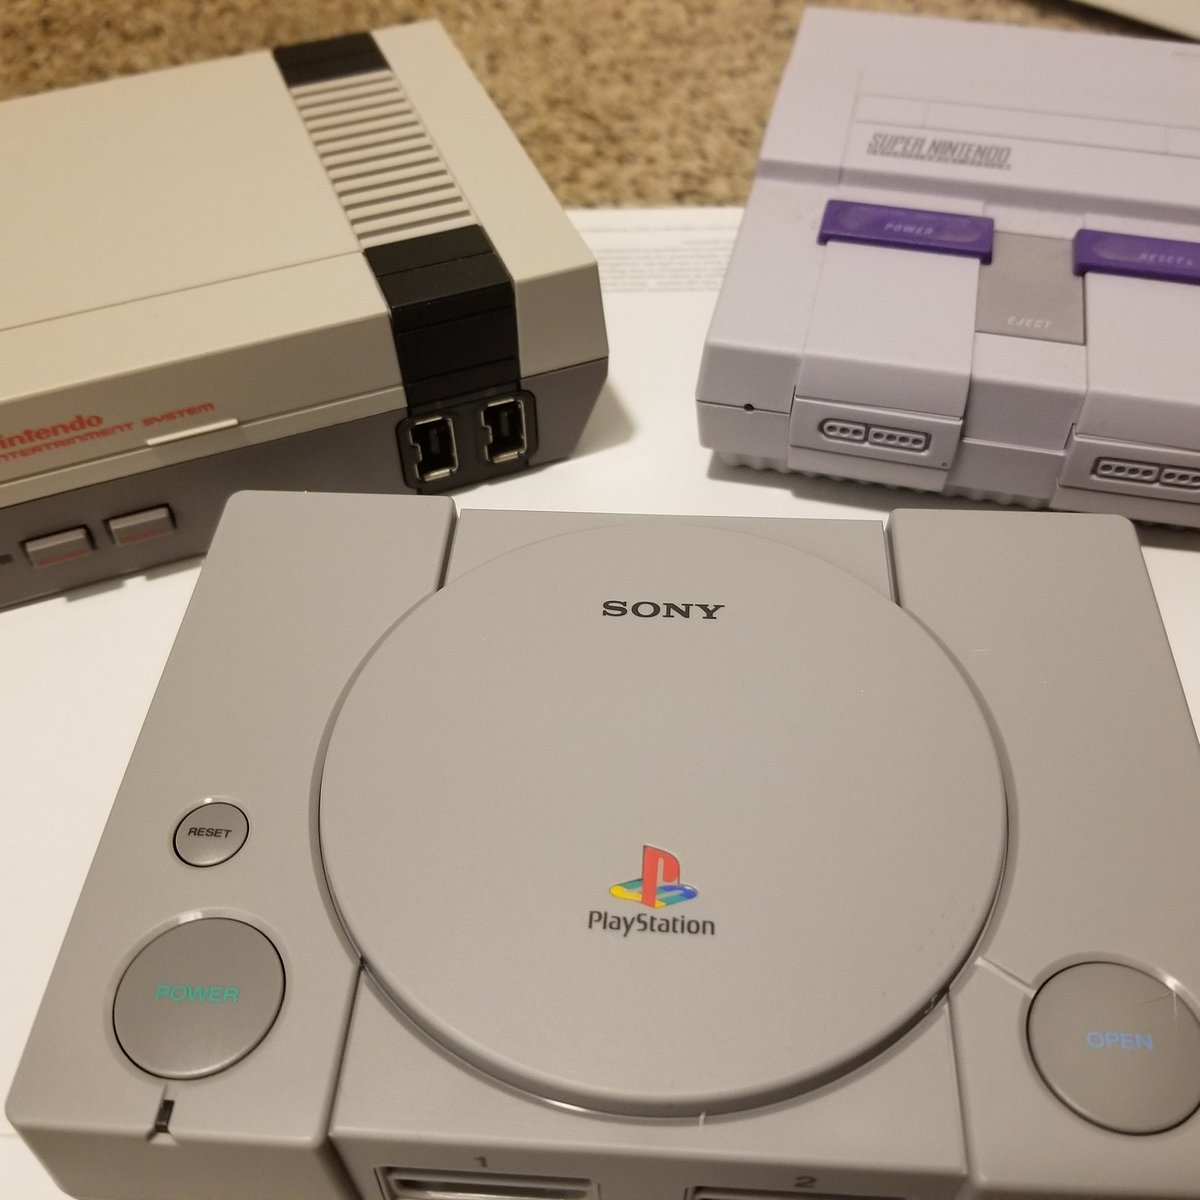 test Twitter Media - The Three Amigos. #Gaming #PSClassic #NESClassic #SNESClassic #Nintendo #PlayStation https://t.co/zkD0V09IuZ